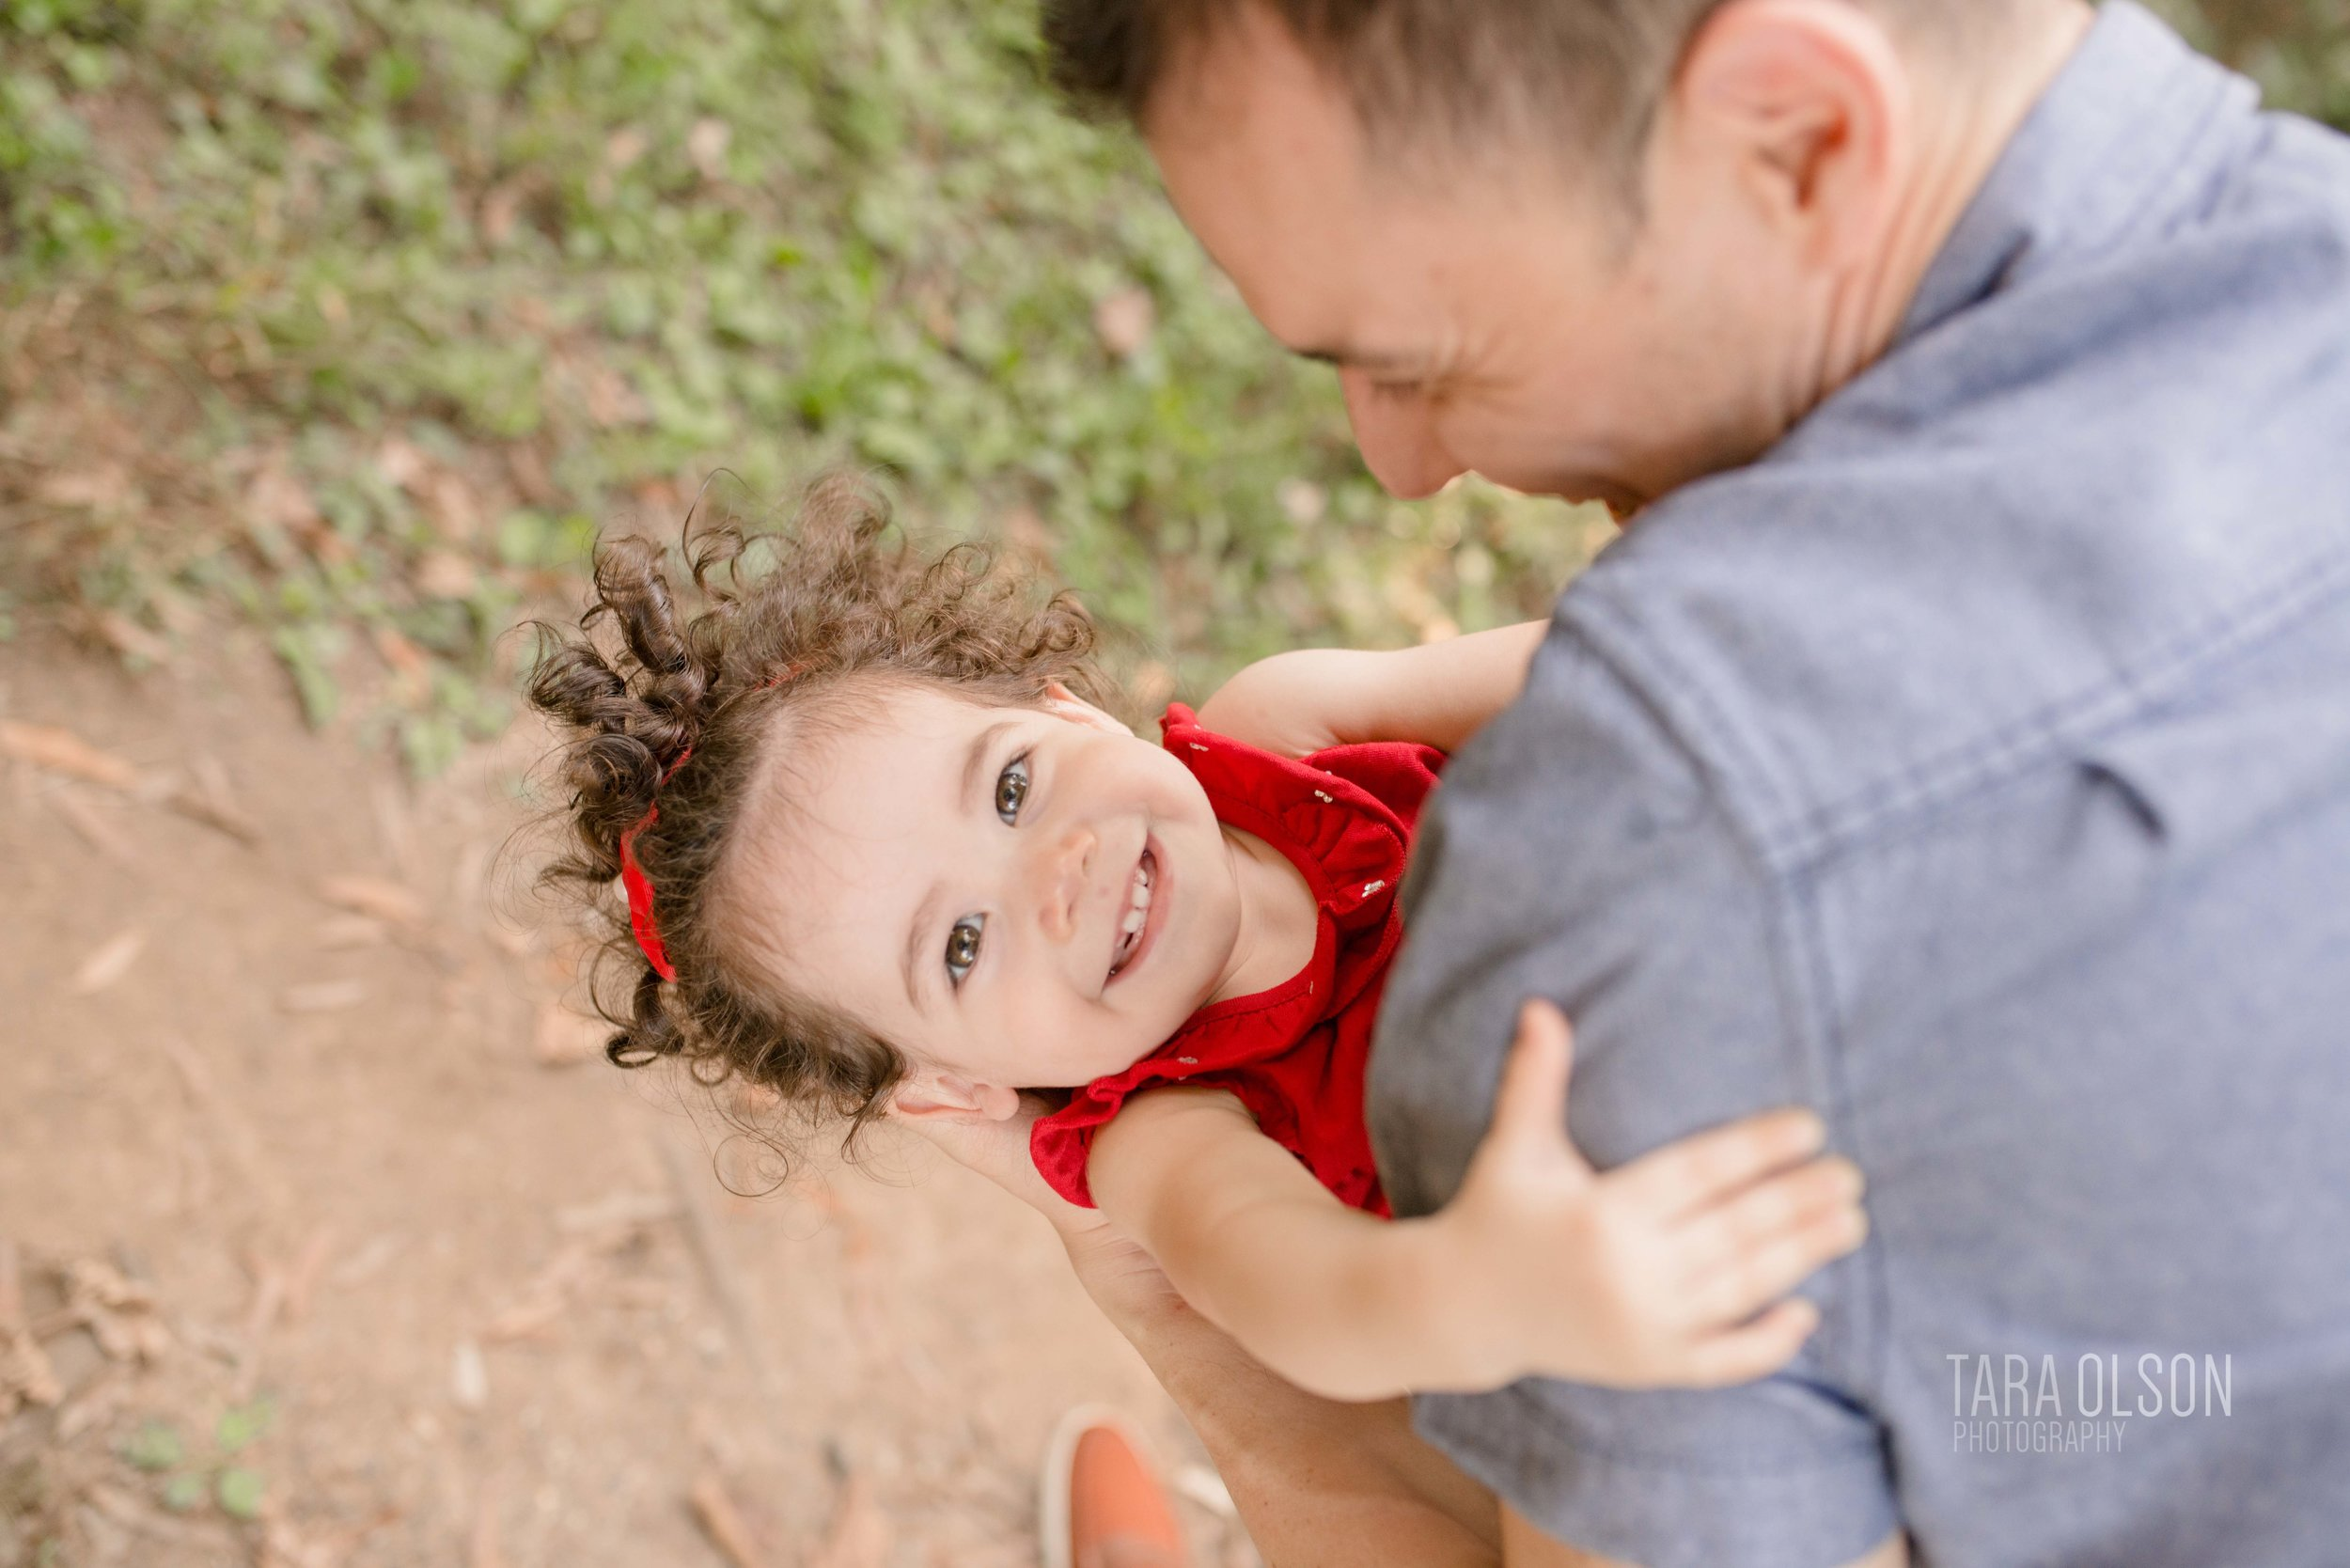 2018 Mini_Theodore Roosevelt Island Park_Family Mini Lifestyle_Tara Olson Photography_3849.jpg